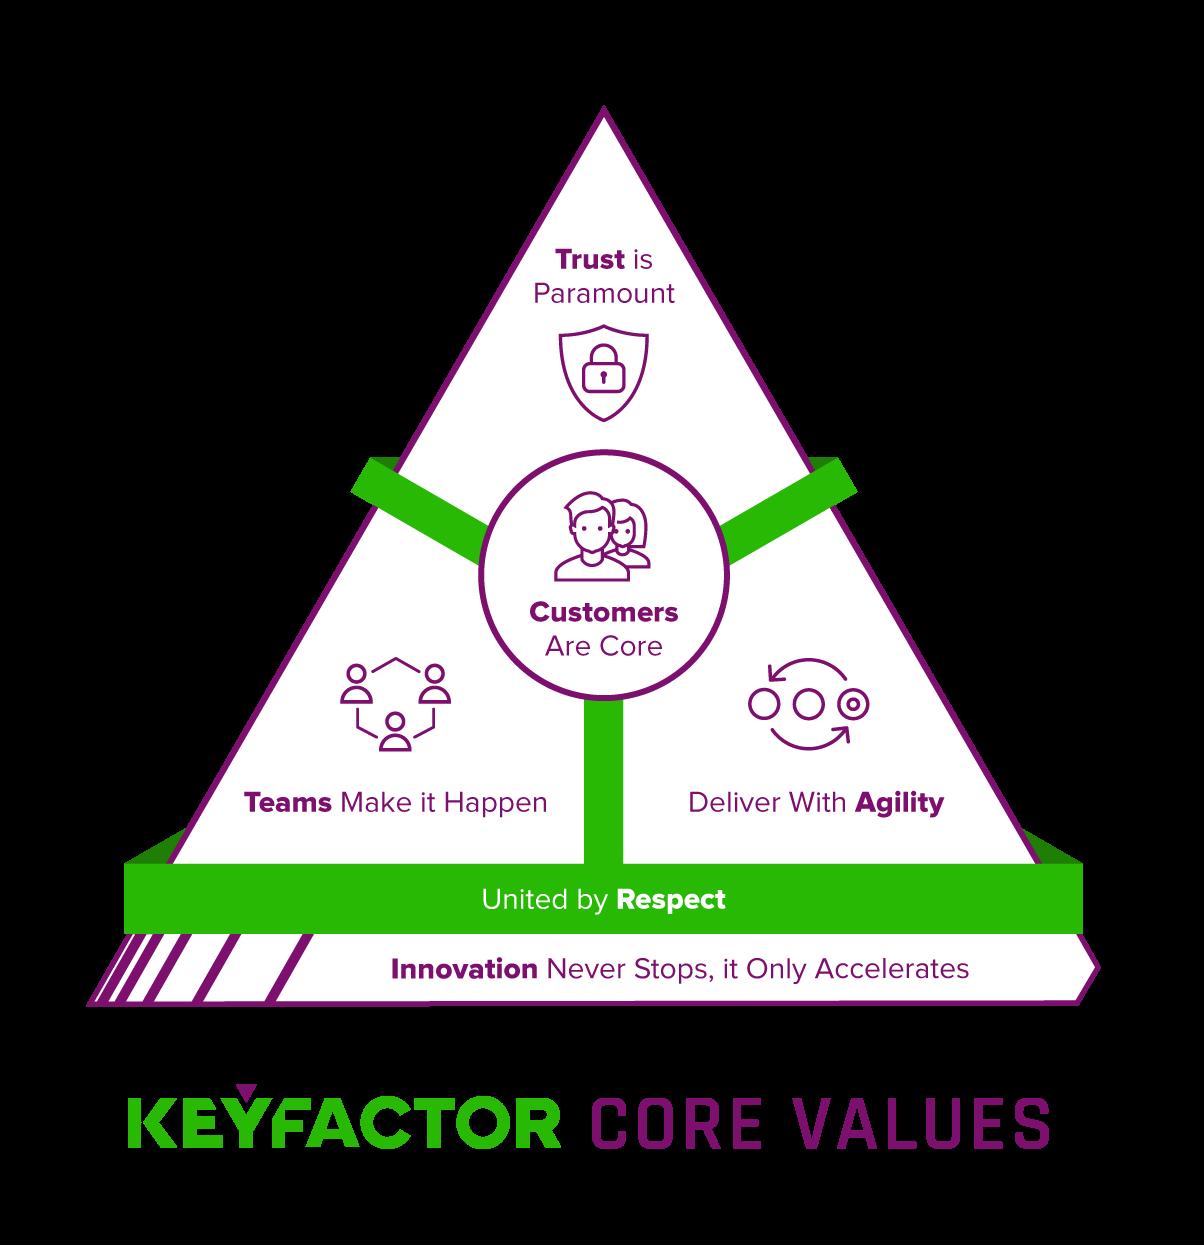 core-values-redtrust-keyfactor